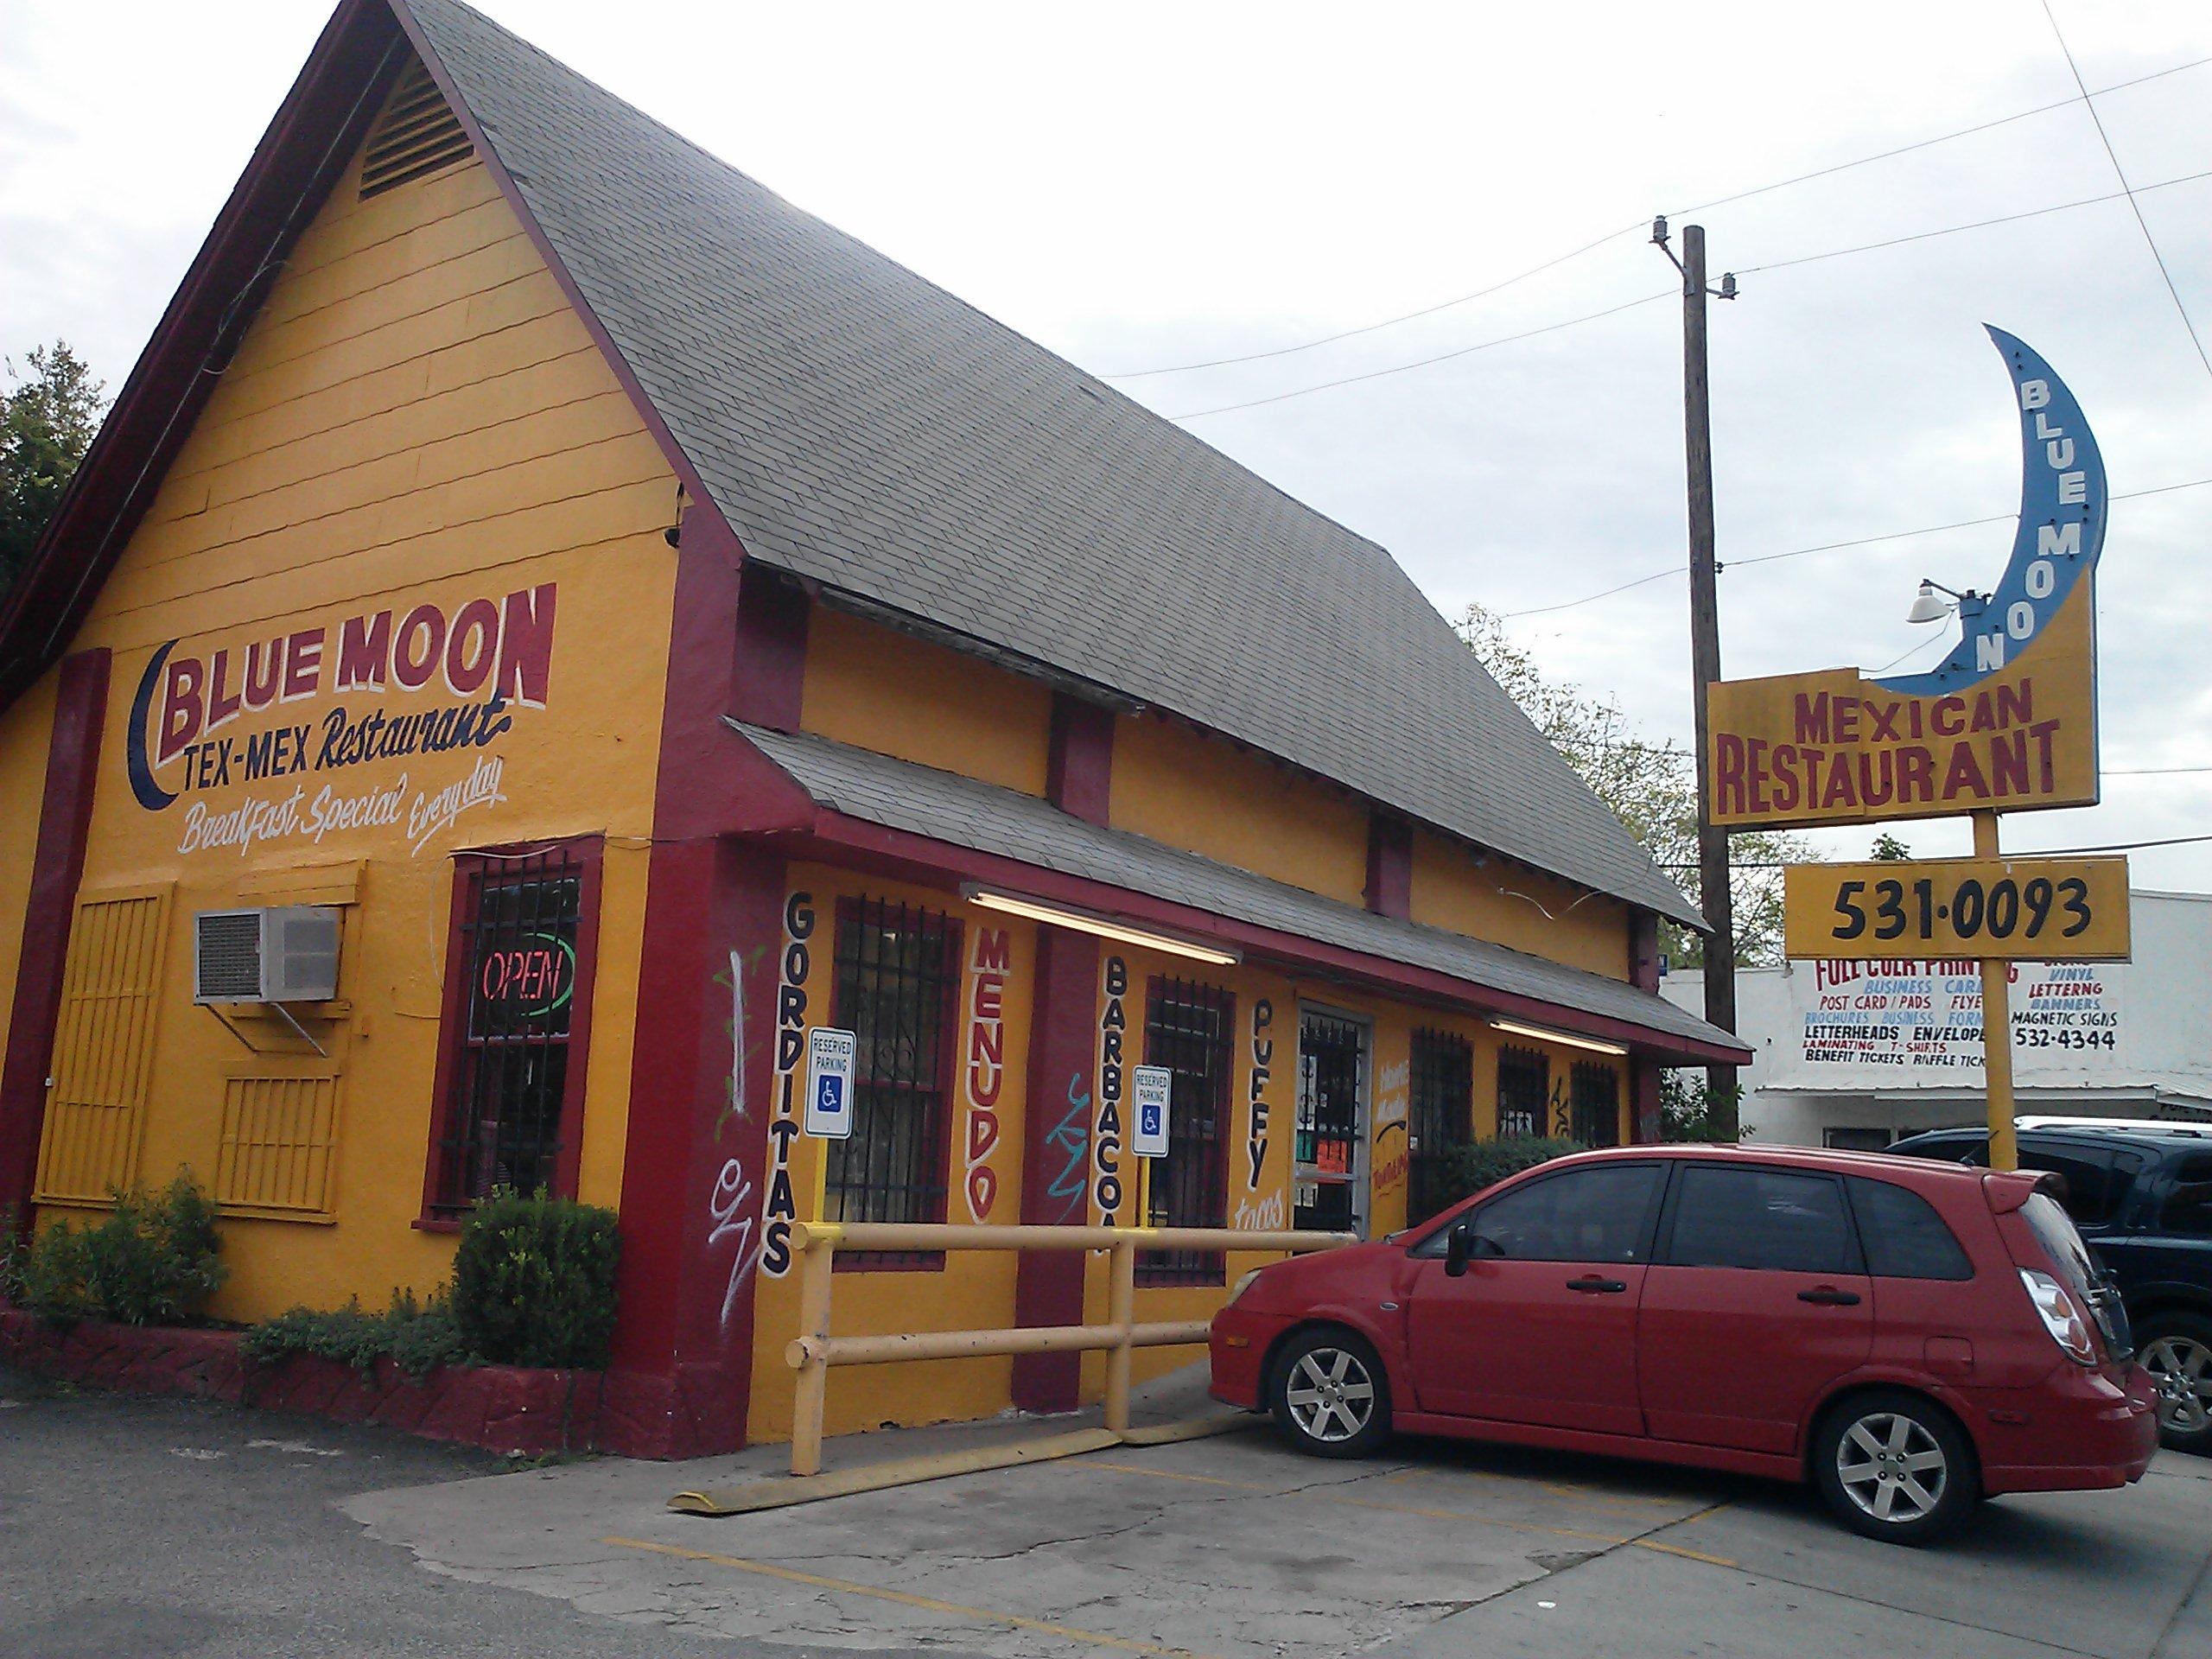 A photo of Blue Moon Mexican Restaurant in San Antonio, Texas.